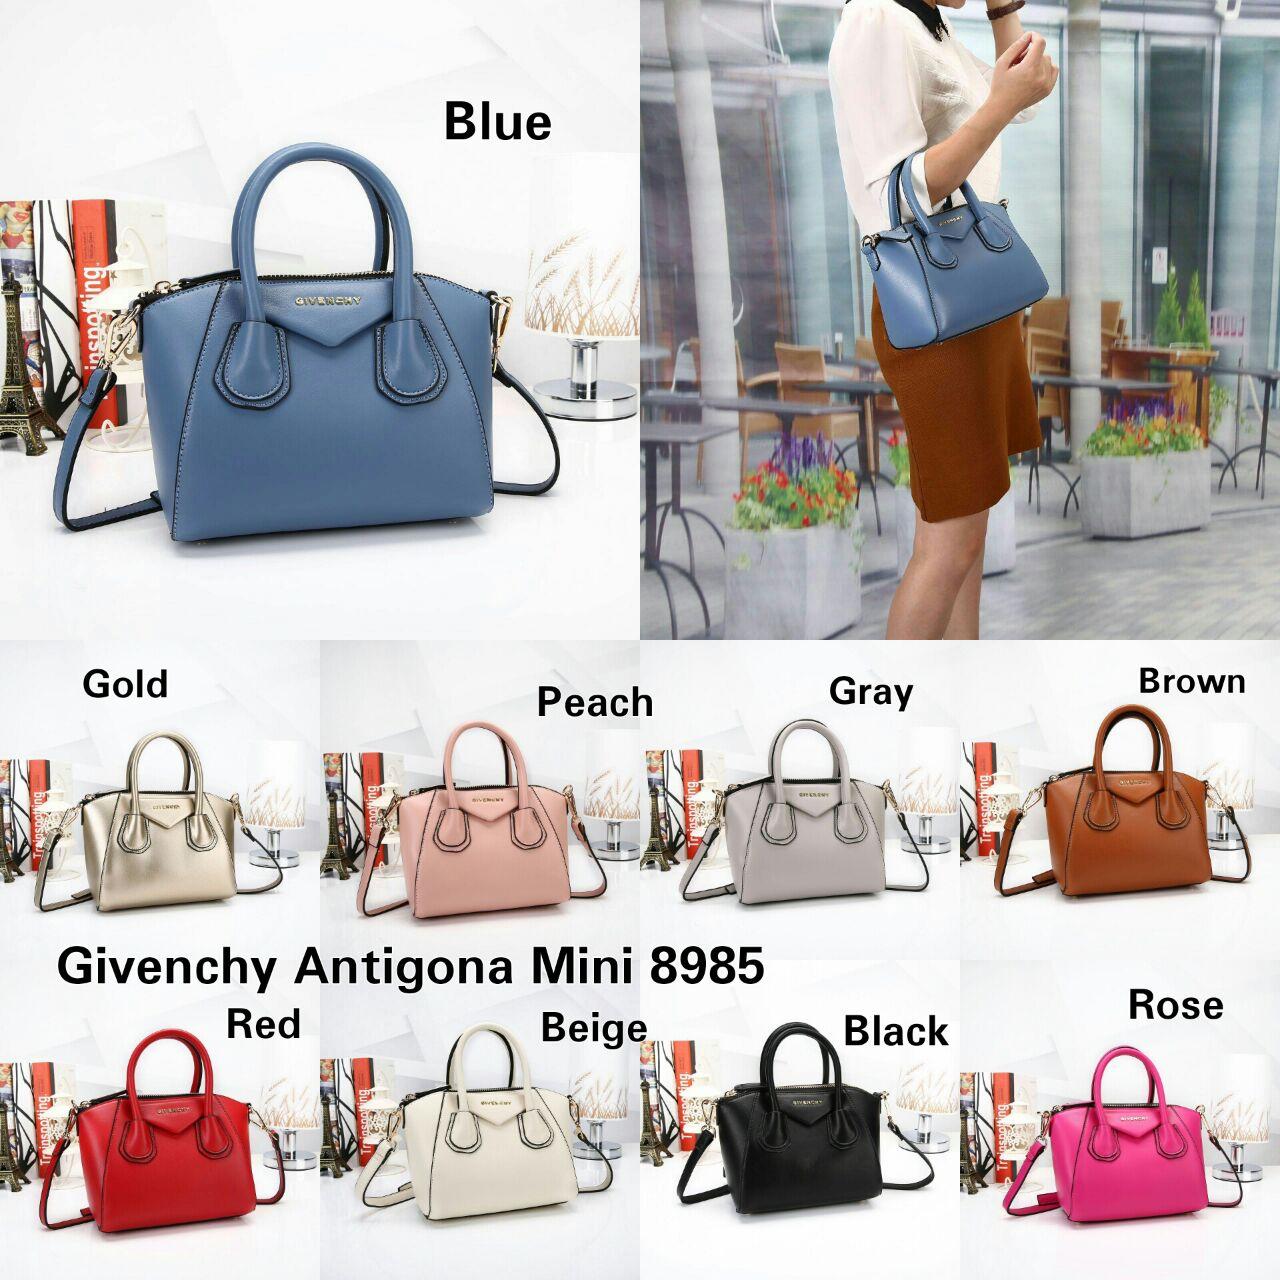 Jual Tas Givenchy Mini 8985 Semi Premium - davidnatx  7626454073